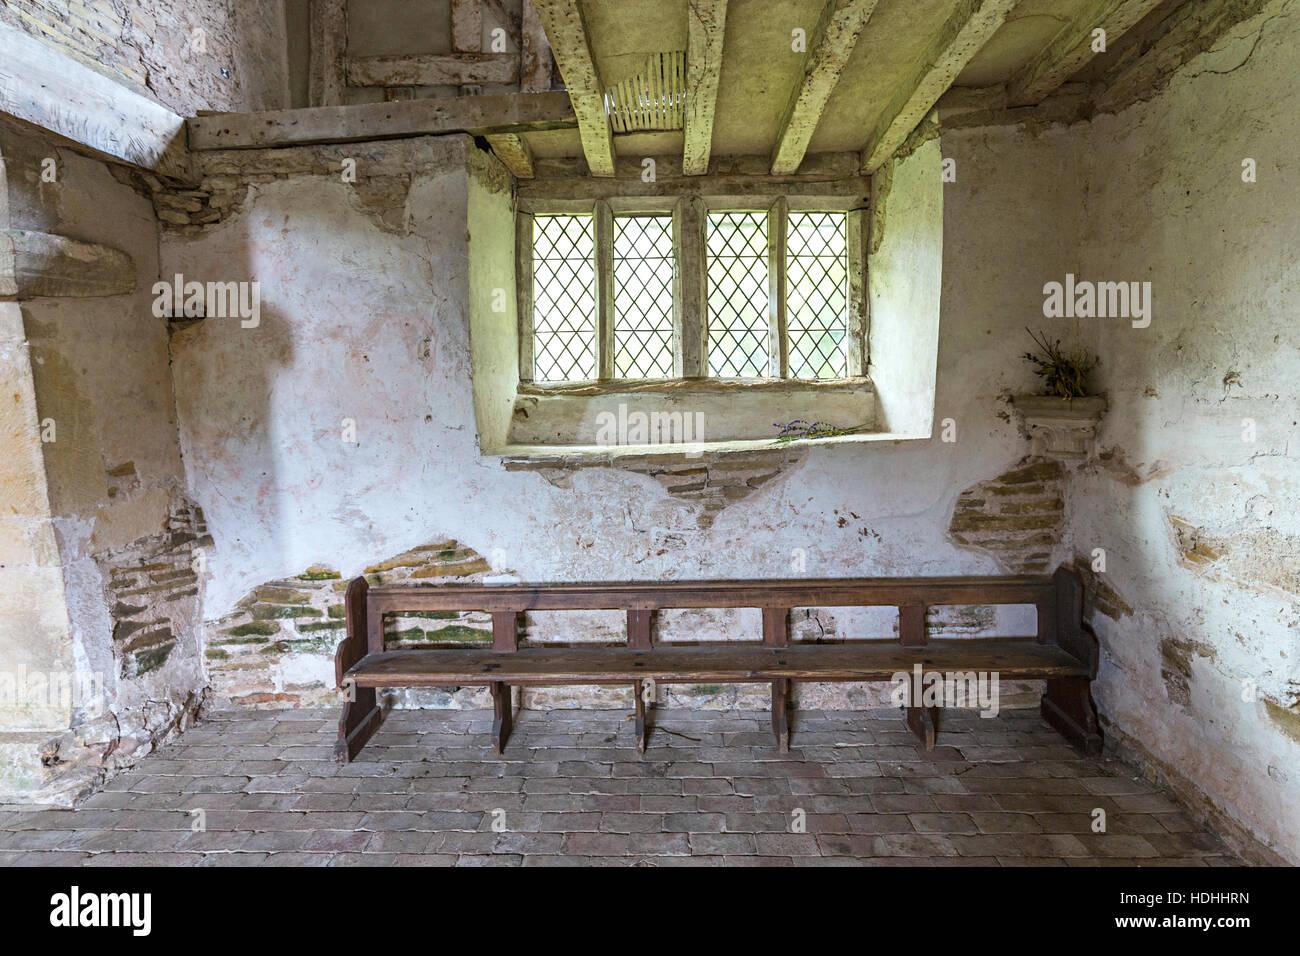 Odda's Chapel, a Saxon church, Deerhurst, Gloucestershire, UK - Stock Image